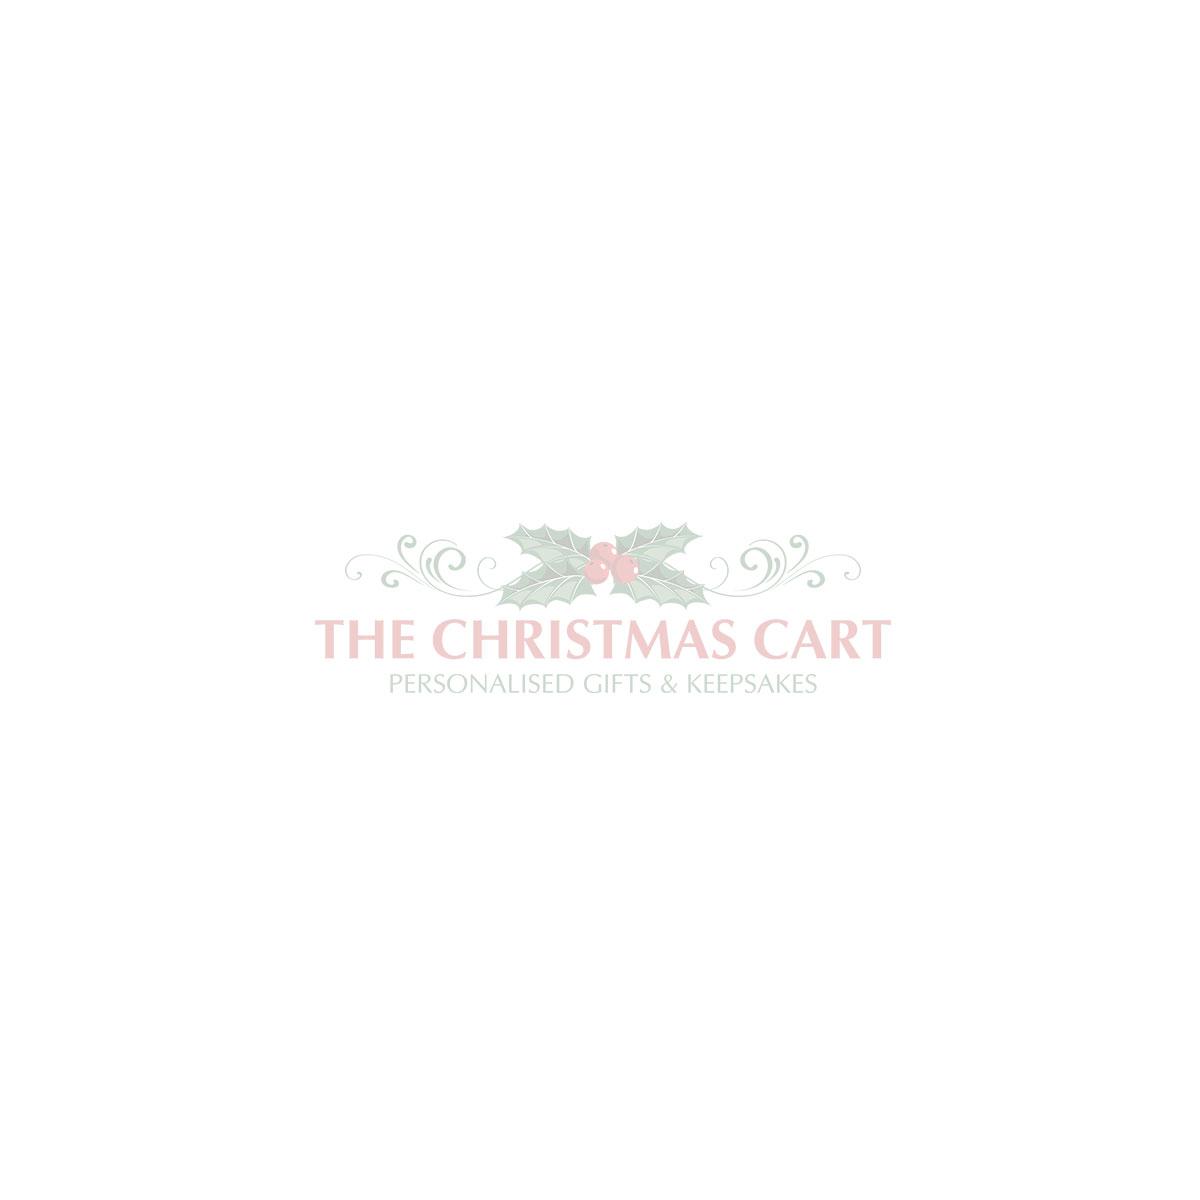 Natural Wood Santa Please Stop Here Arrow Sign - Santa Face- Whole product